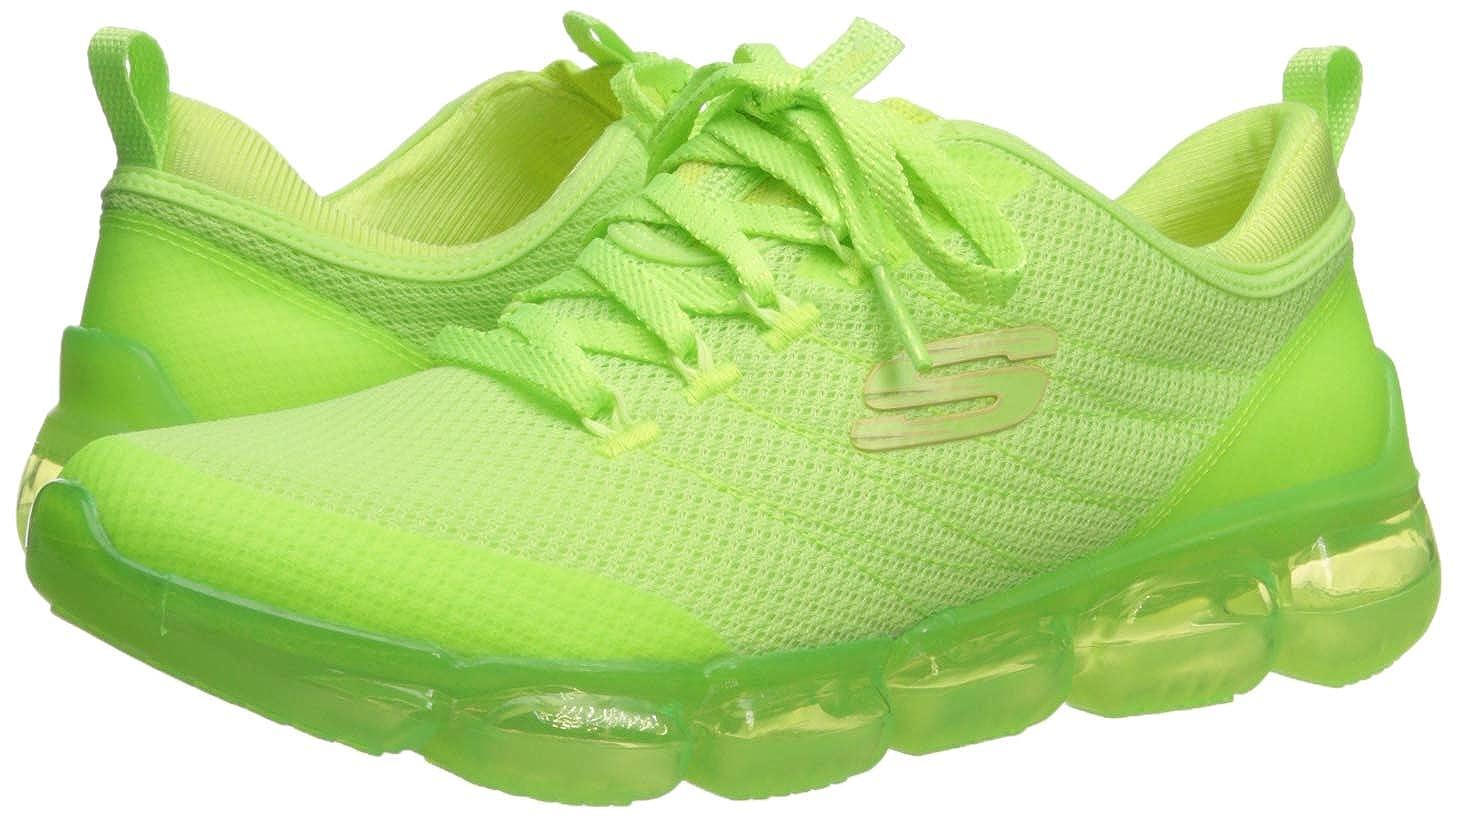 Falsedad Gama de Periódico  Buy Skechers Women's Skech-AIR 92-Significance Sneaker, Lime, 5 M US at  Amazon.in